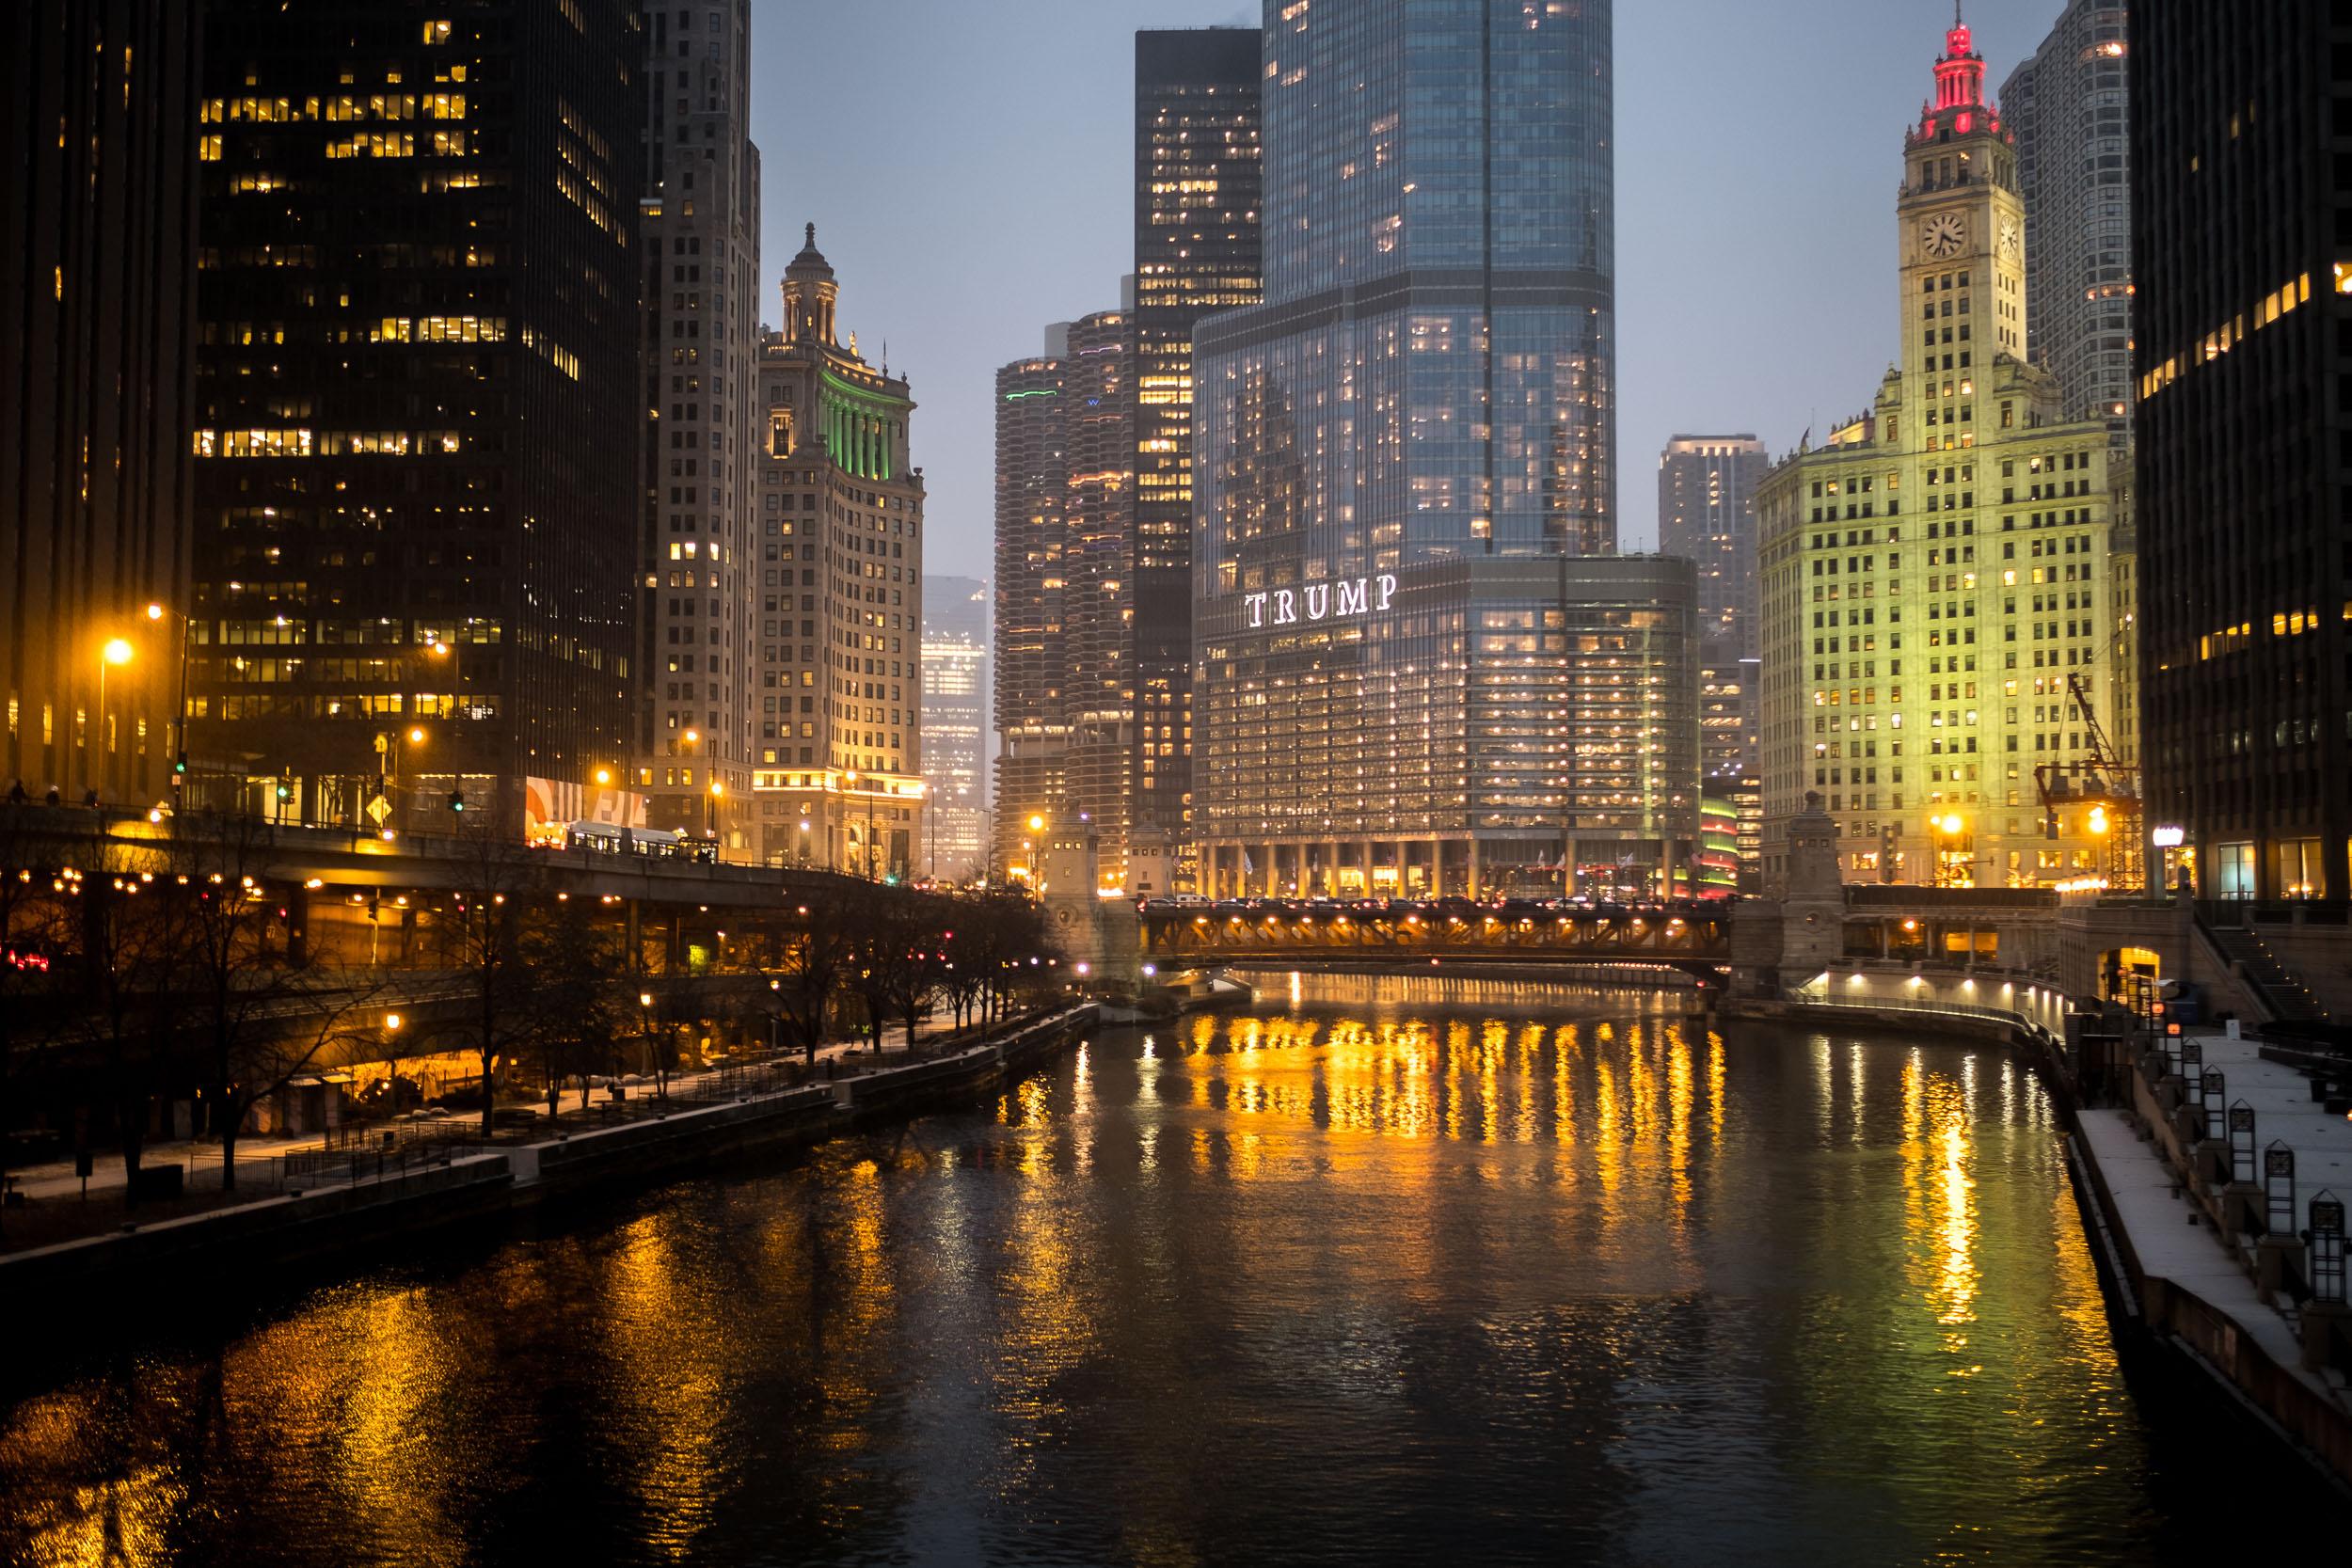 MR_161210_Chicago_0275.jpg